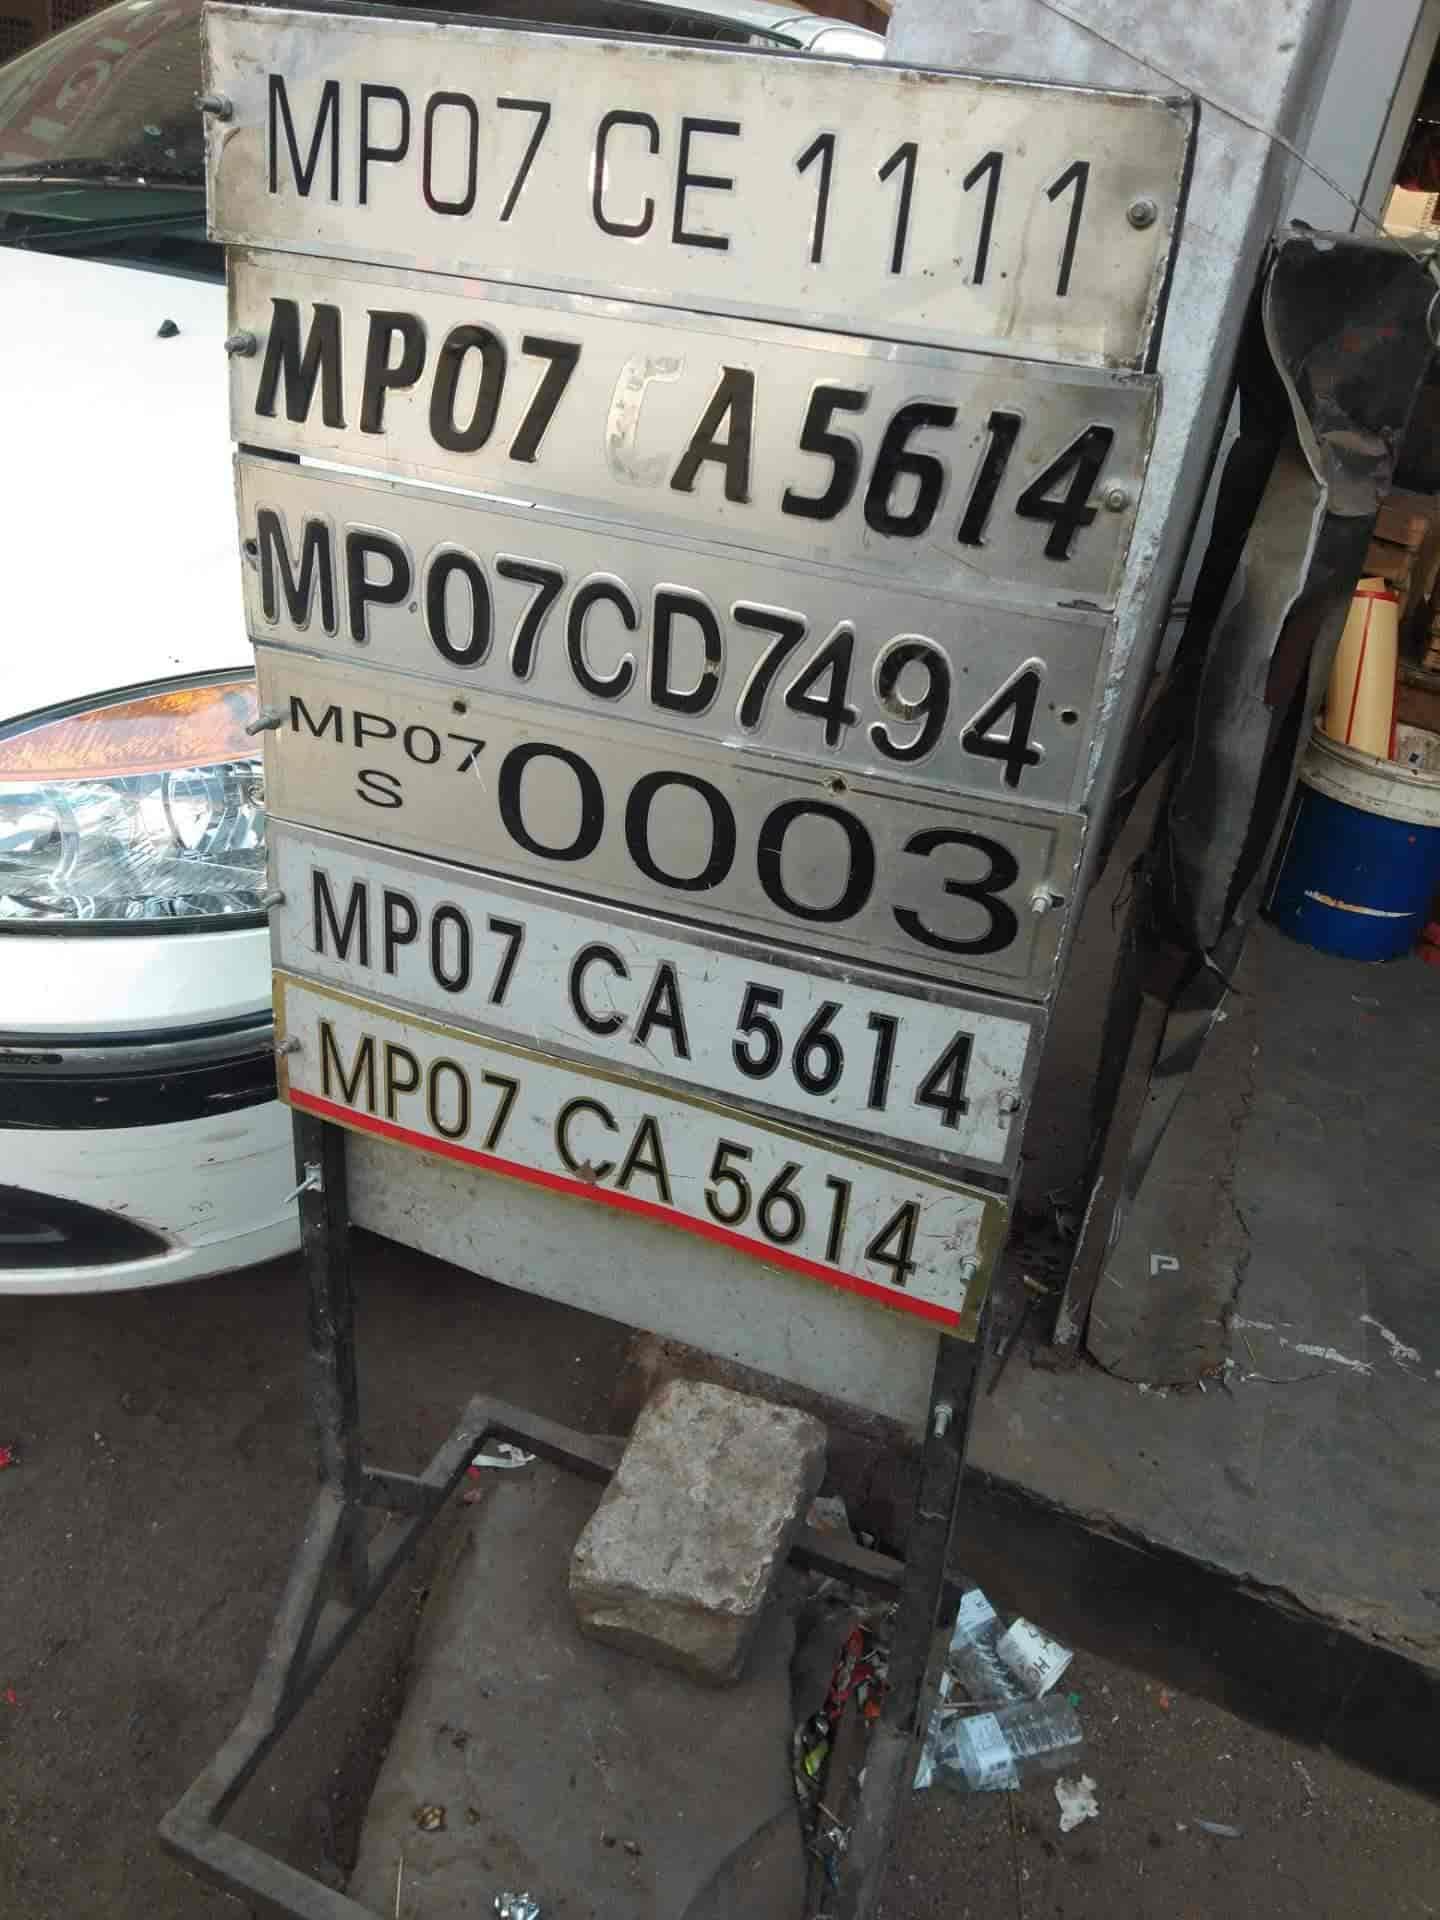 DRIVERS UPDATE: DIALCOM 5614